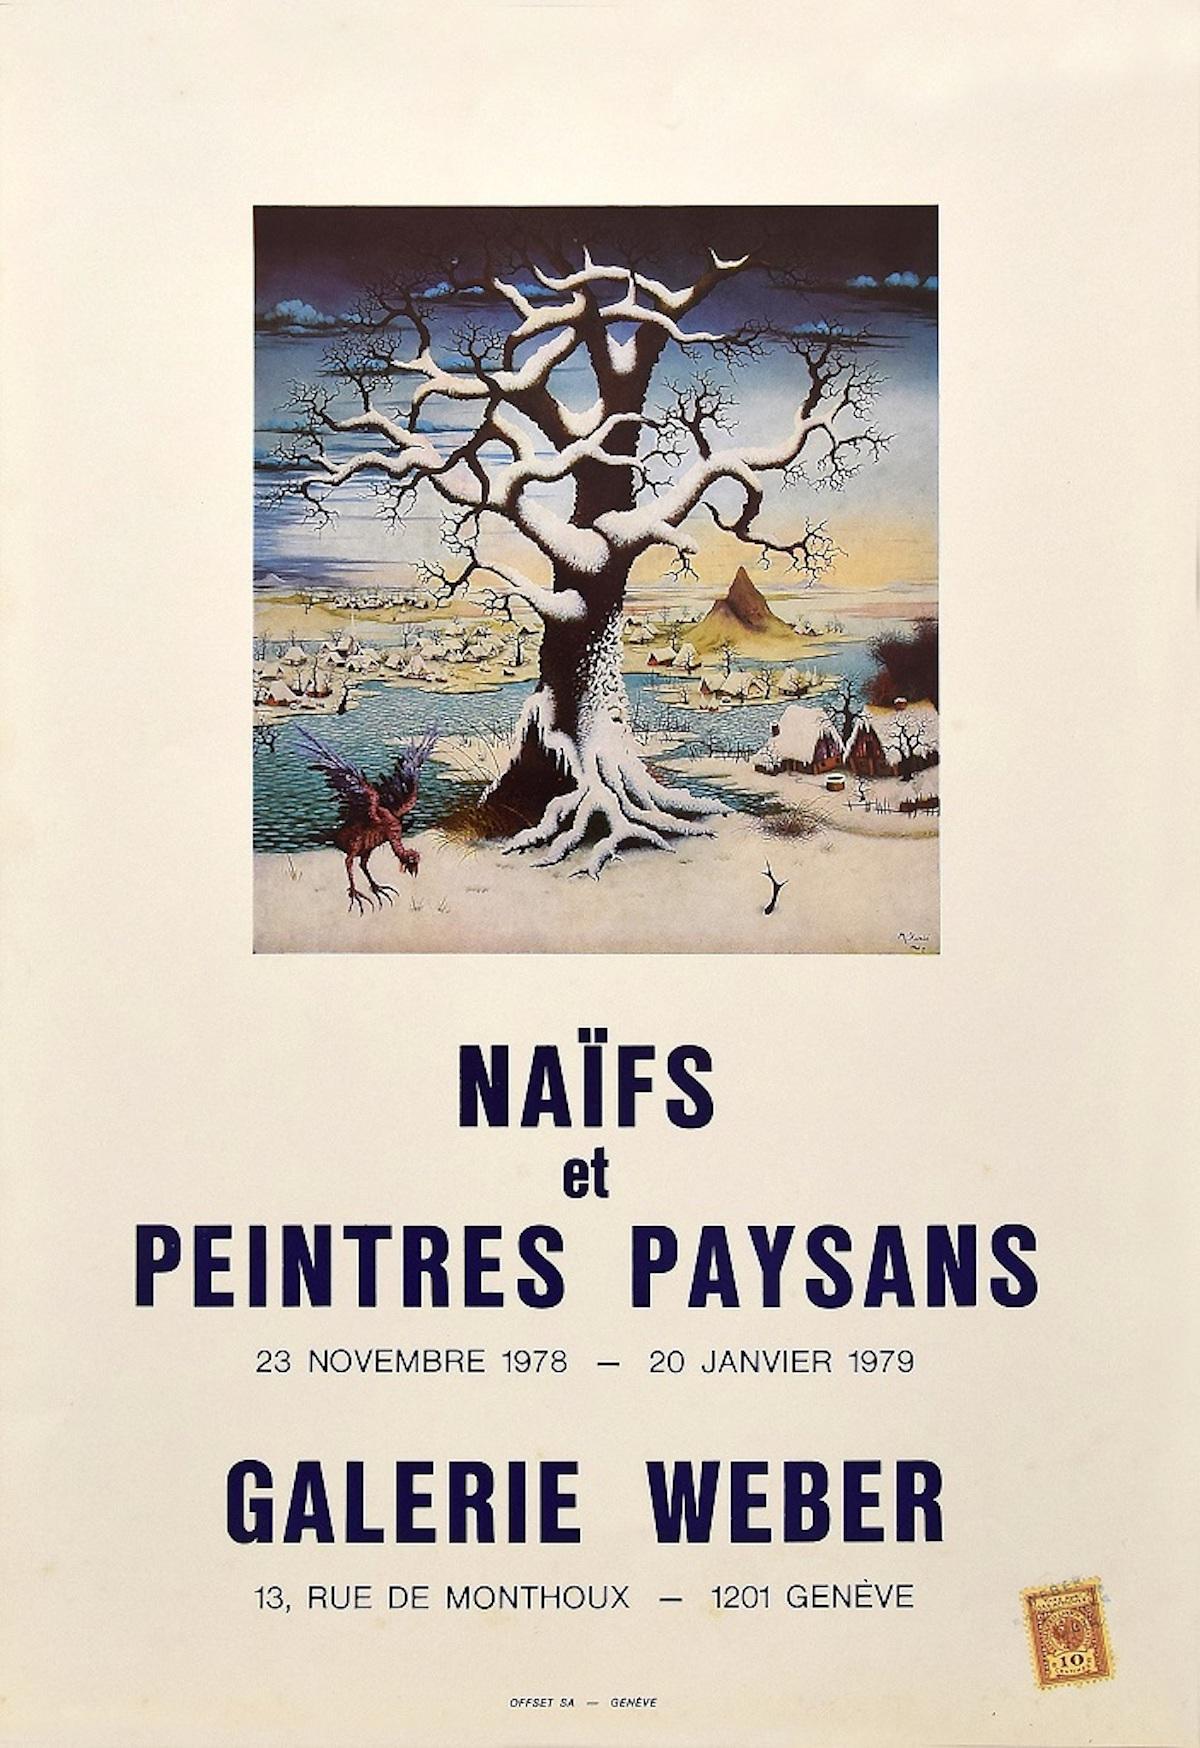 Naif Poster Exhibition - Galerie Weber Genève - 1978/79